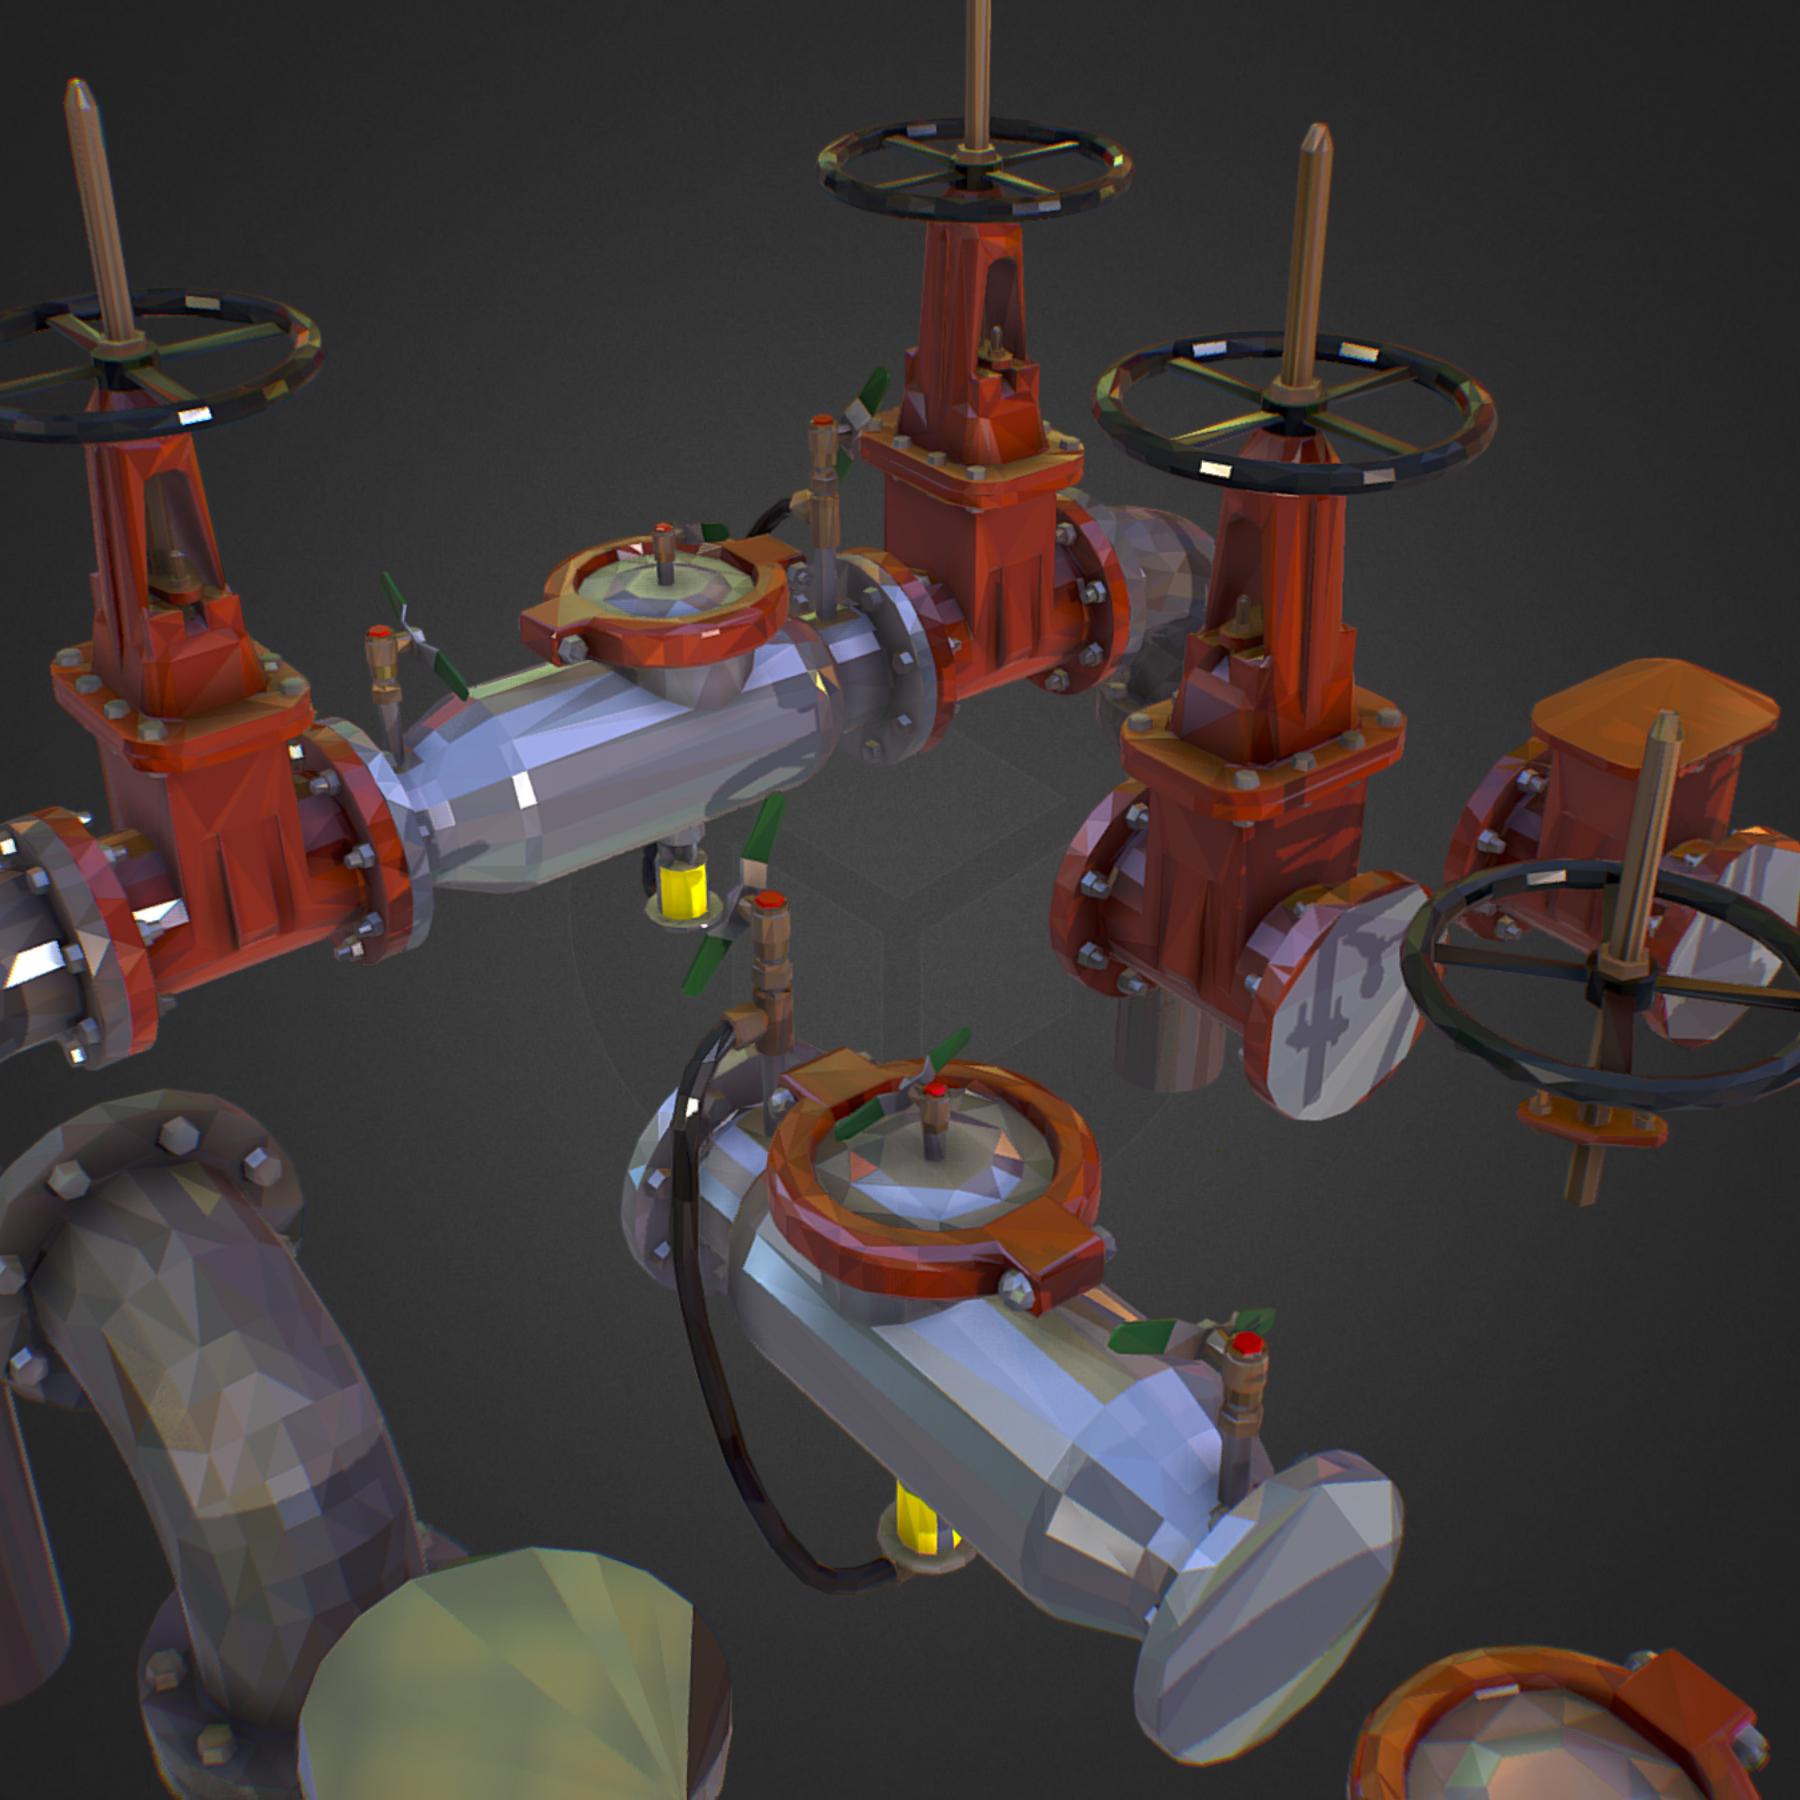 Low Poly ART Backflow Water Pipe Constructor 3d model max 3ds max plugin fbx ma mb tga targa icb vda vst pix obj 272563